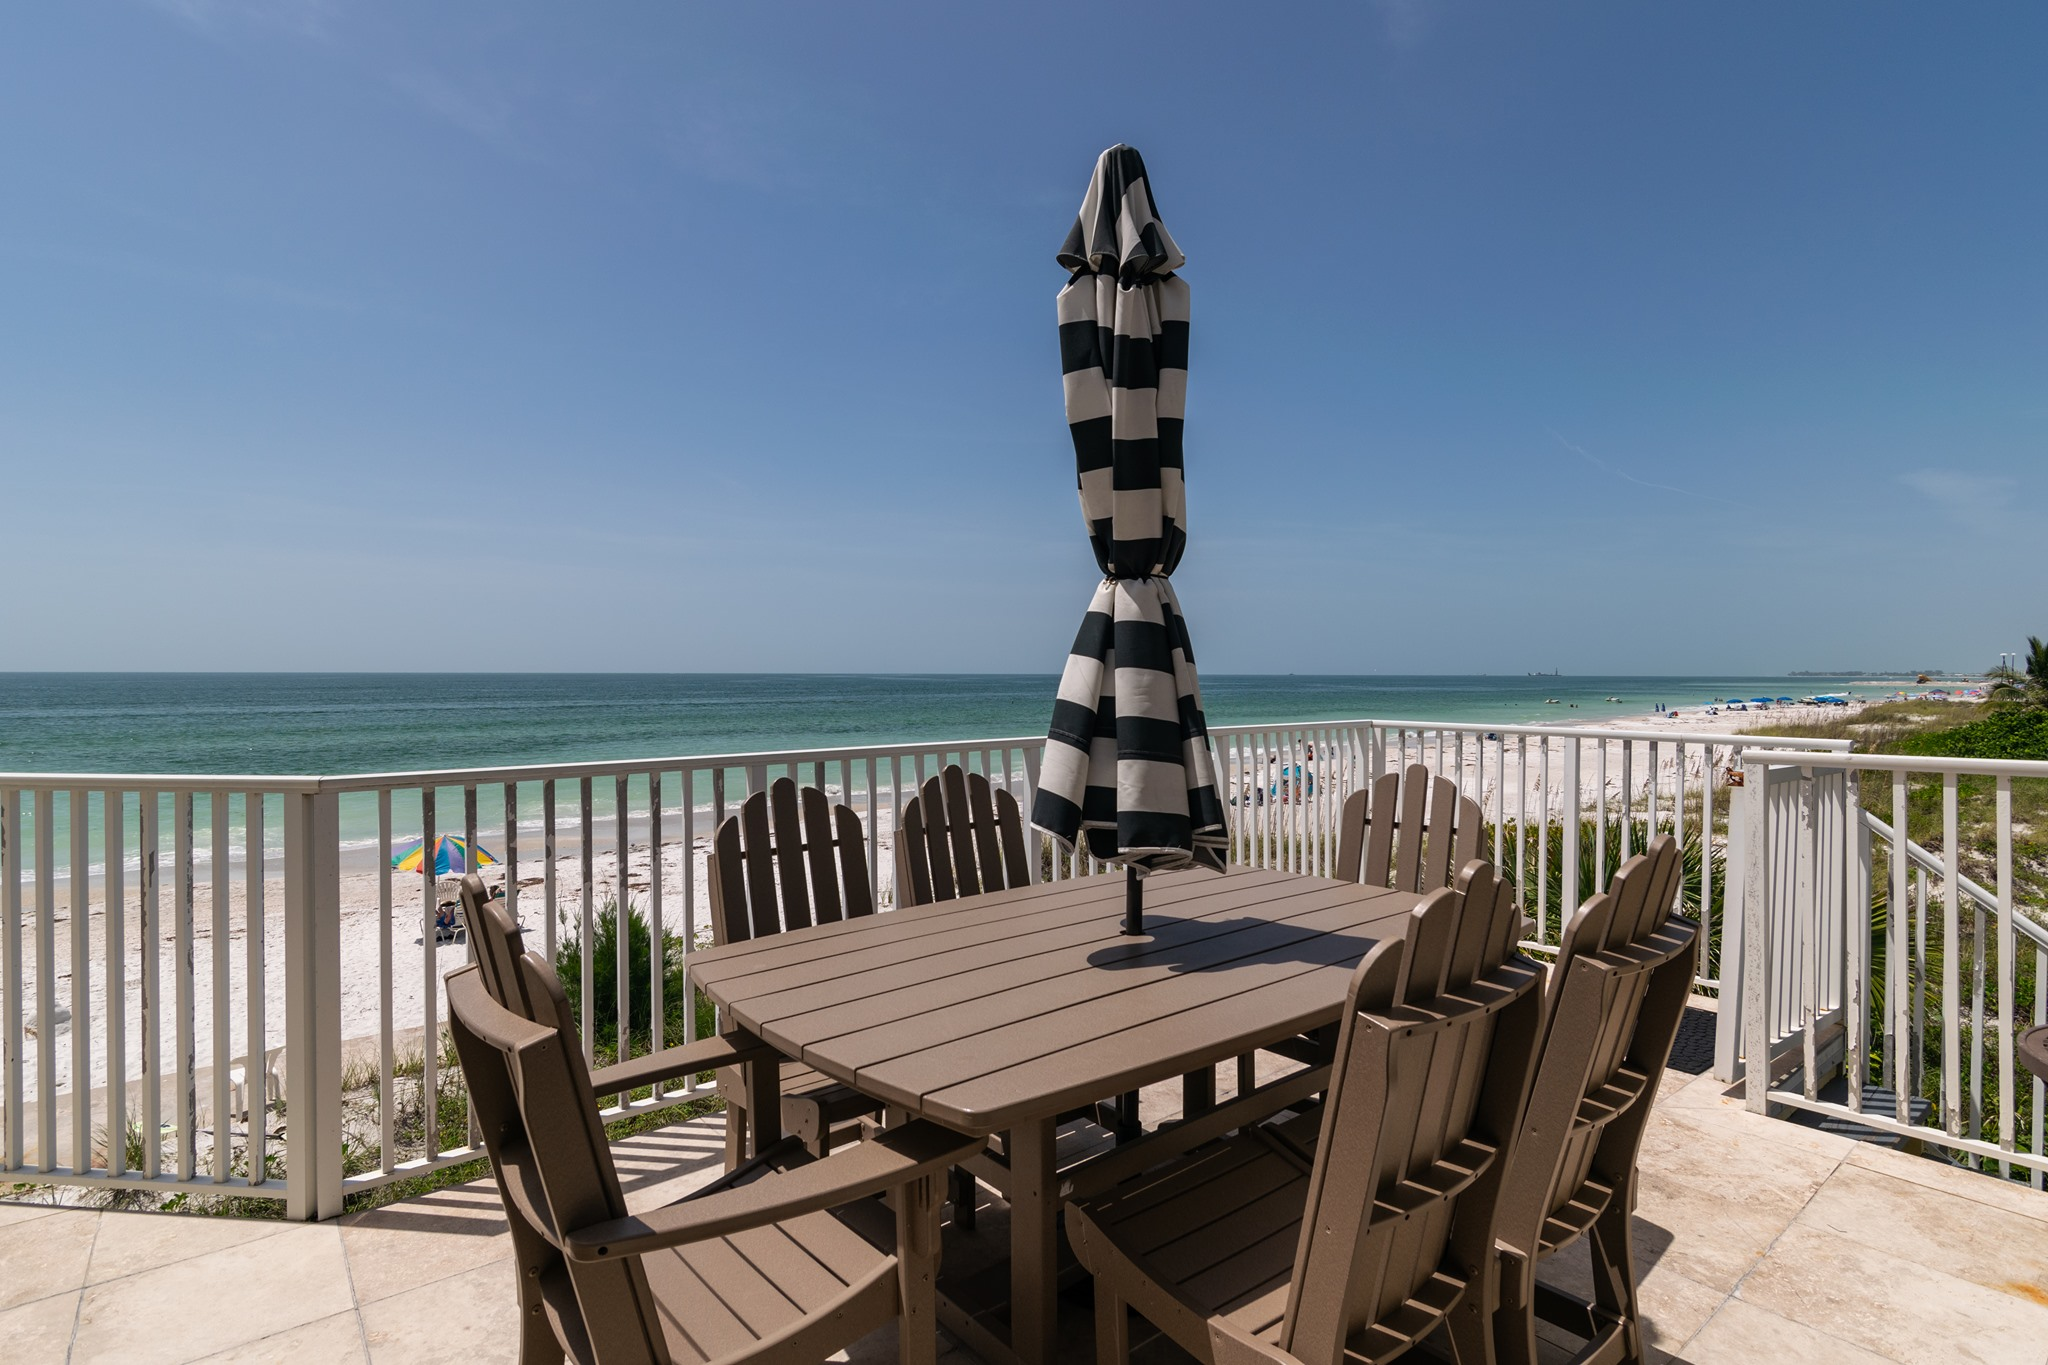 Island Vacation Properties Anna Maria Island Florida Vacation Rental Home